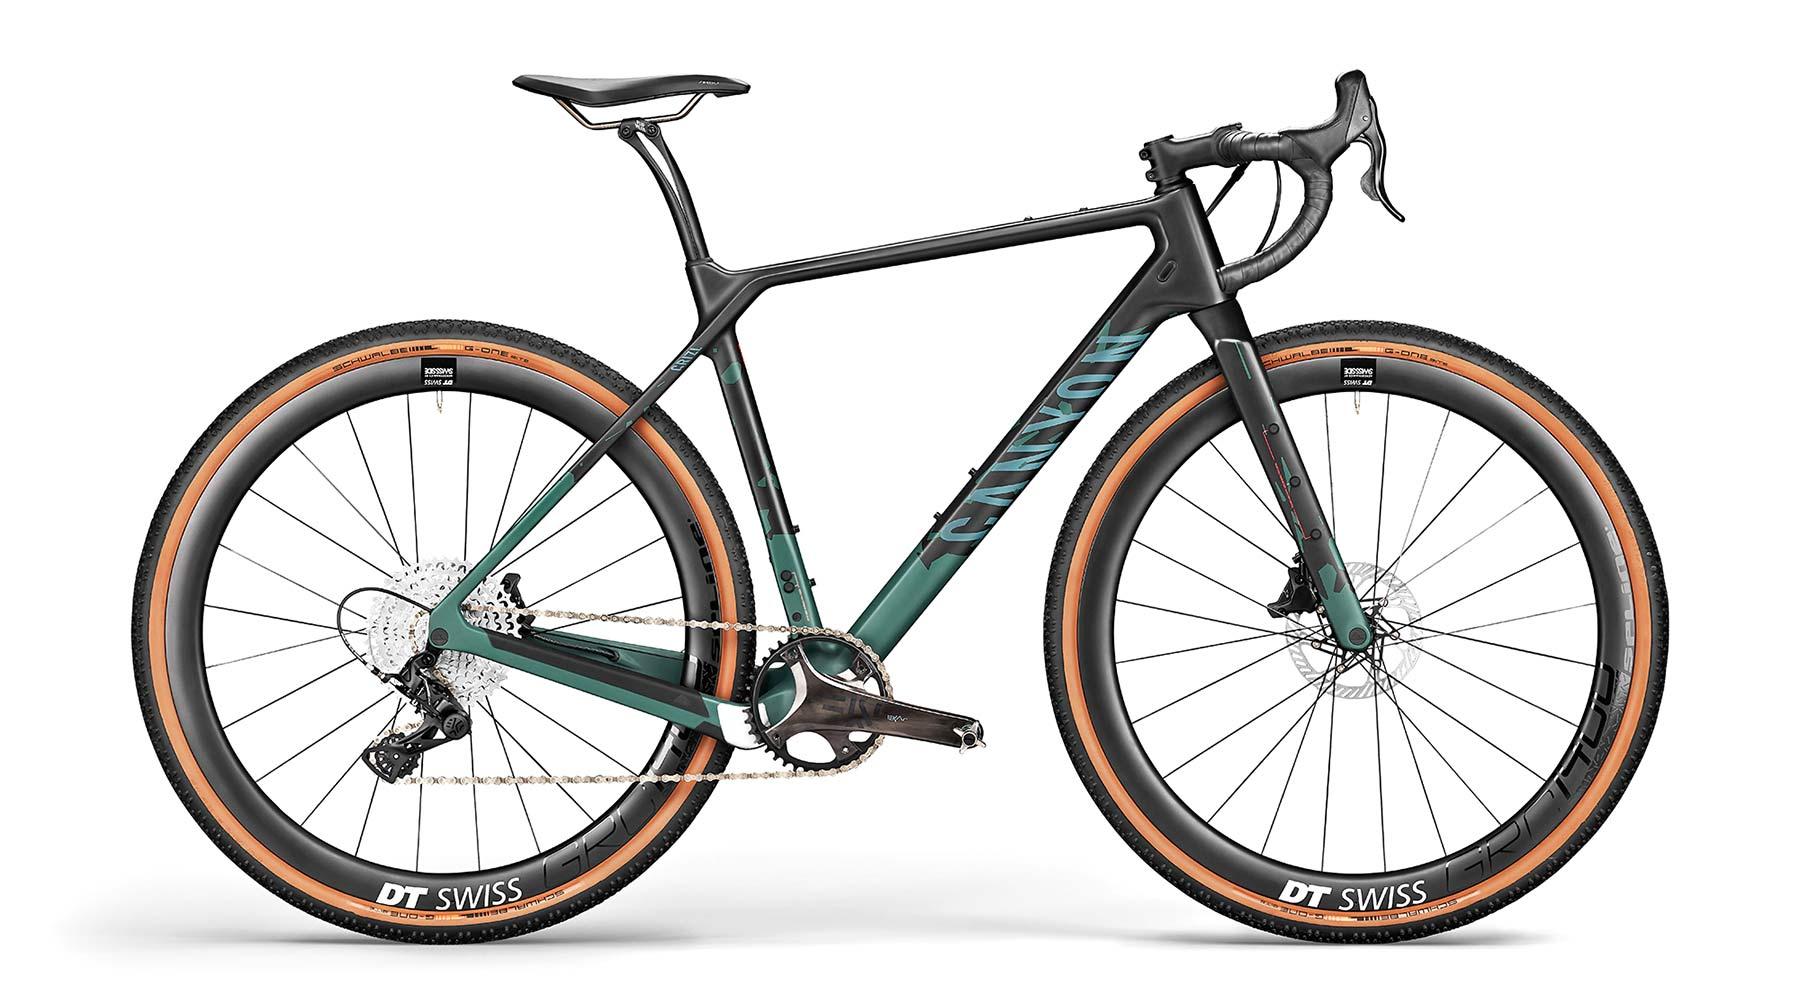 All-new 2021 Canyon Grizl carbon gravel bike bikepacking adventure, CF SLX 1X